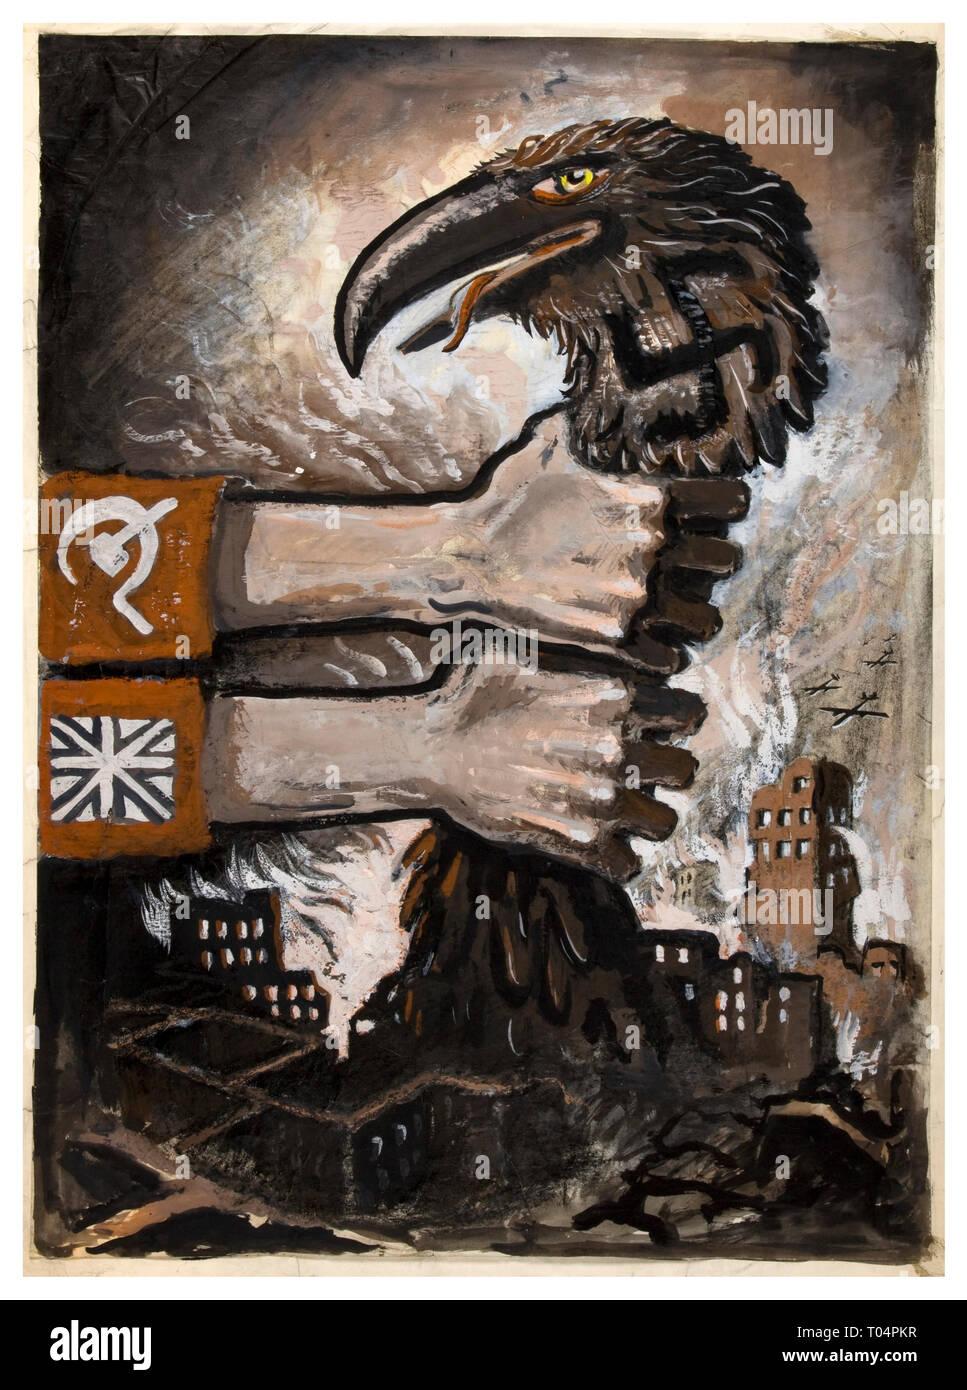 Vintage Propaganda Poster WW2 Allied Powers Soviet and British unity strangling predatory swastika wearing Germany hawk-like bird midst Nazi Germany ruins 1940's - Stock Image